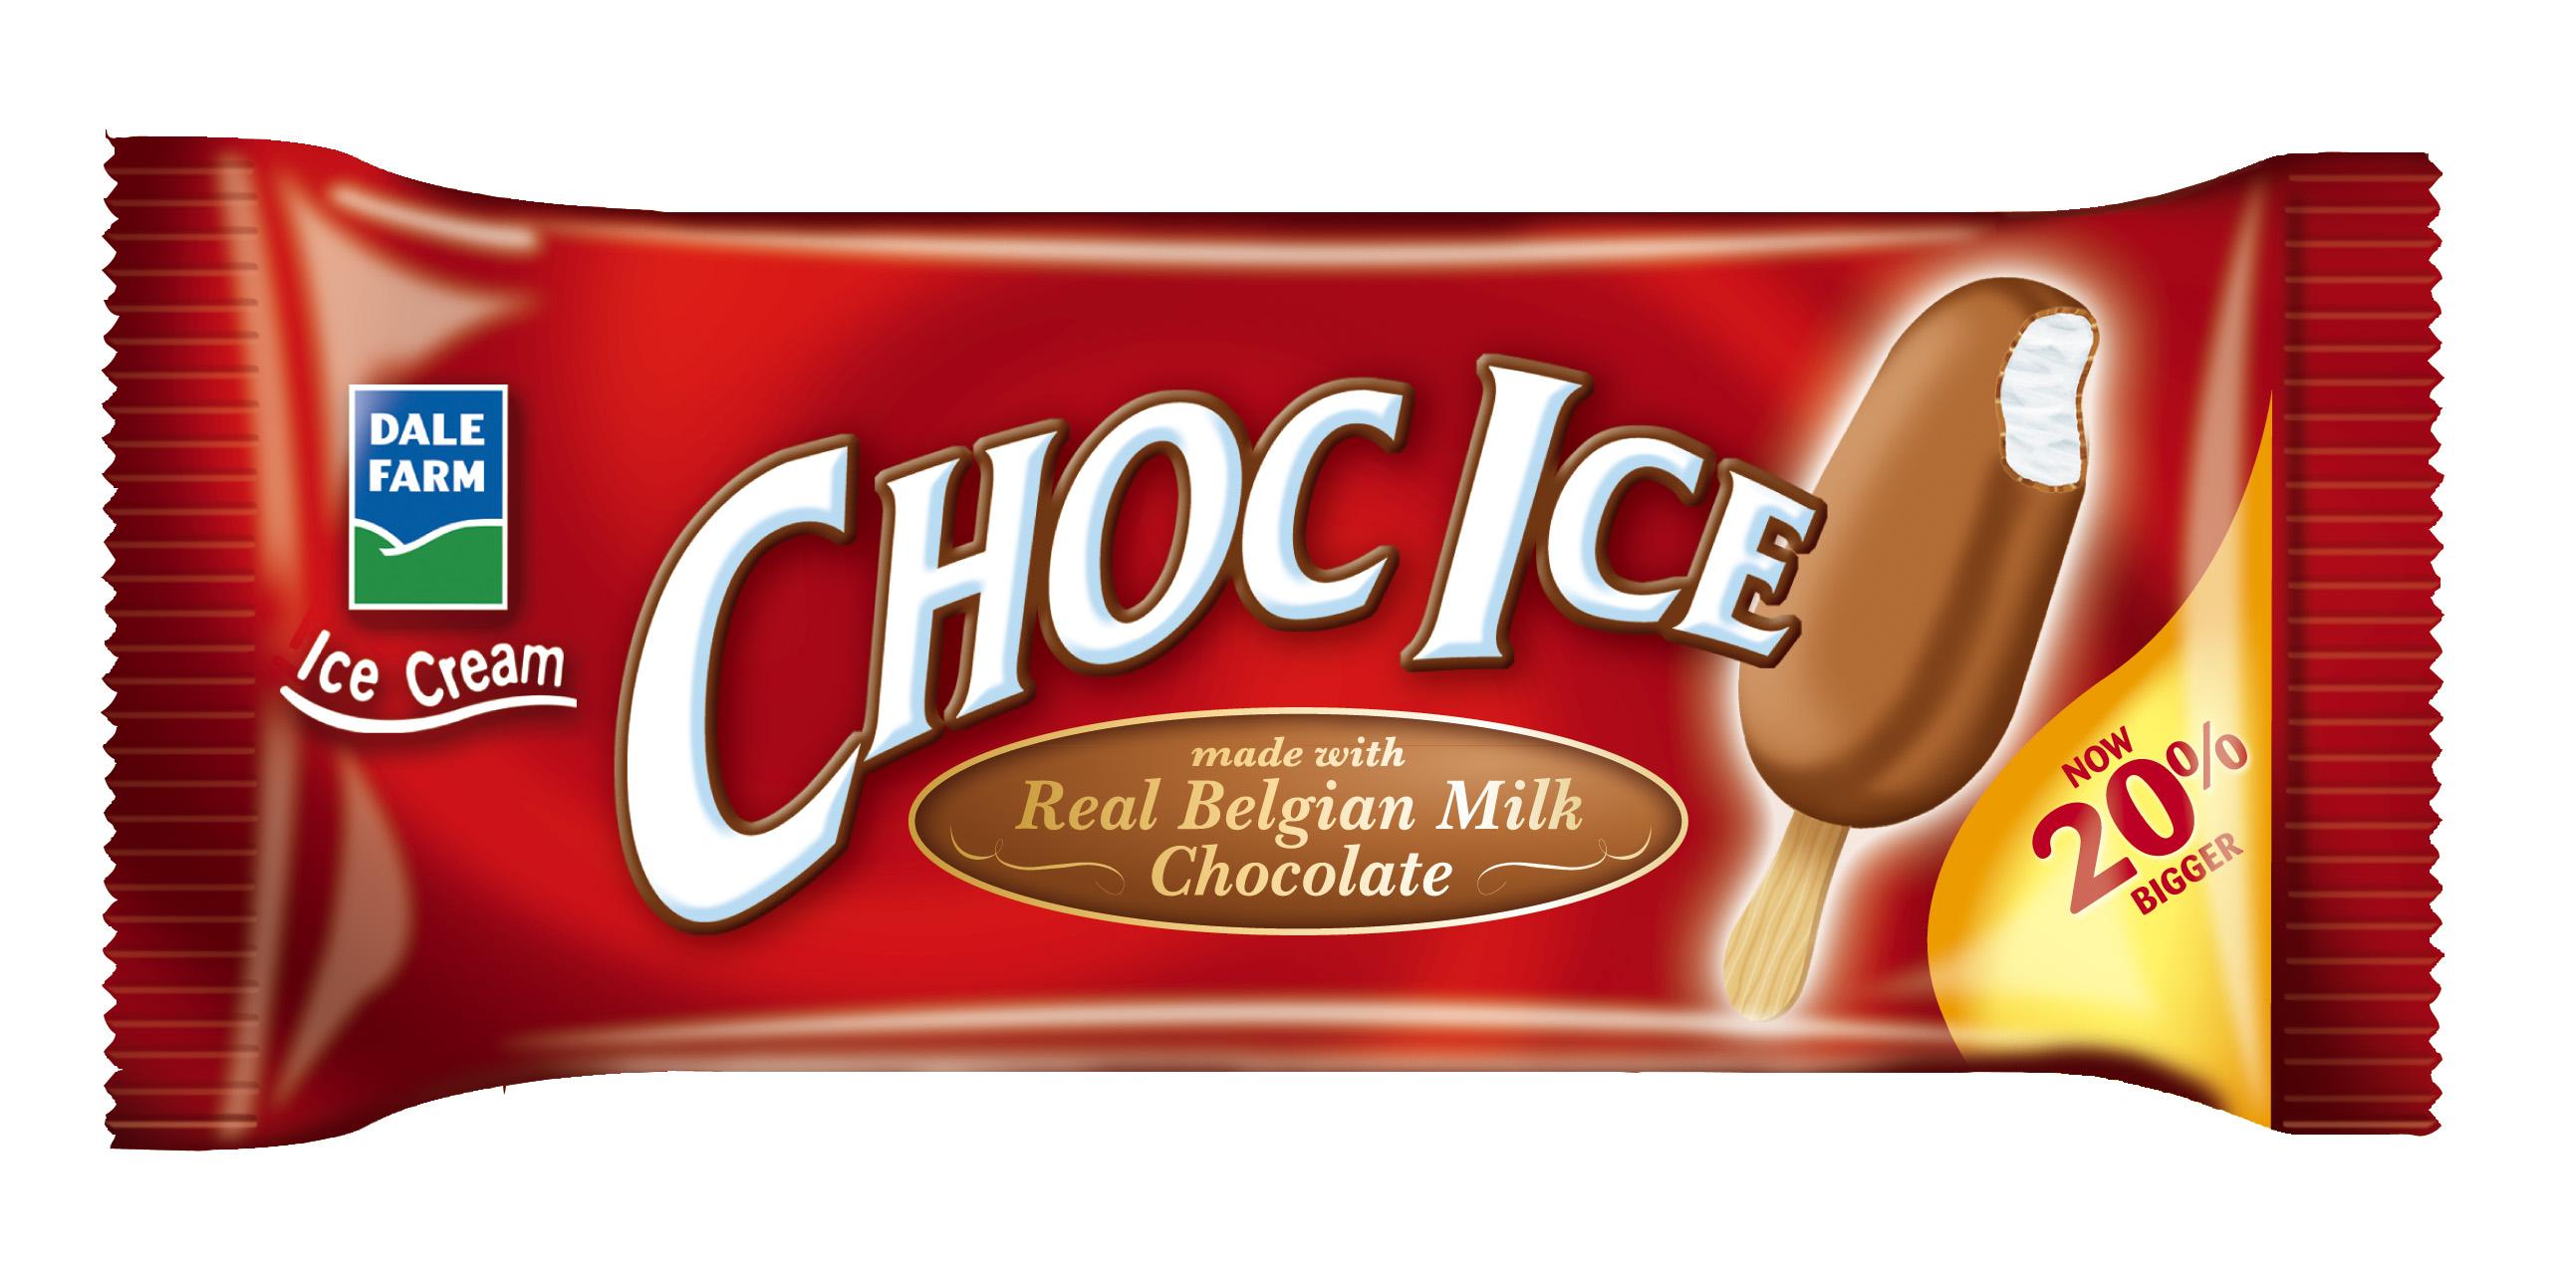 GIANT CHOC ICE PACK 07